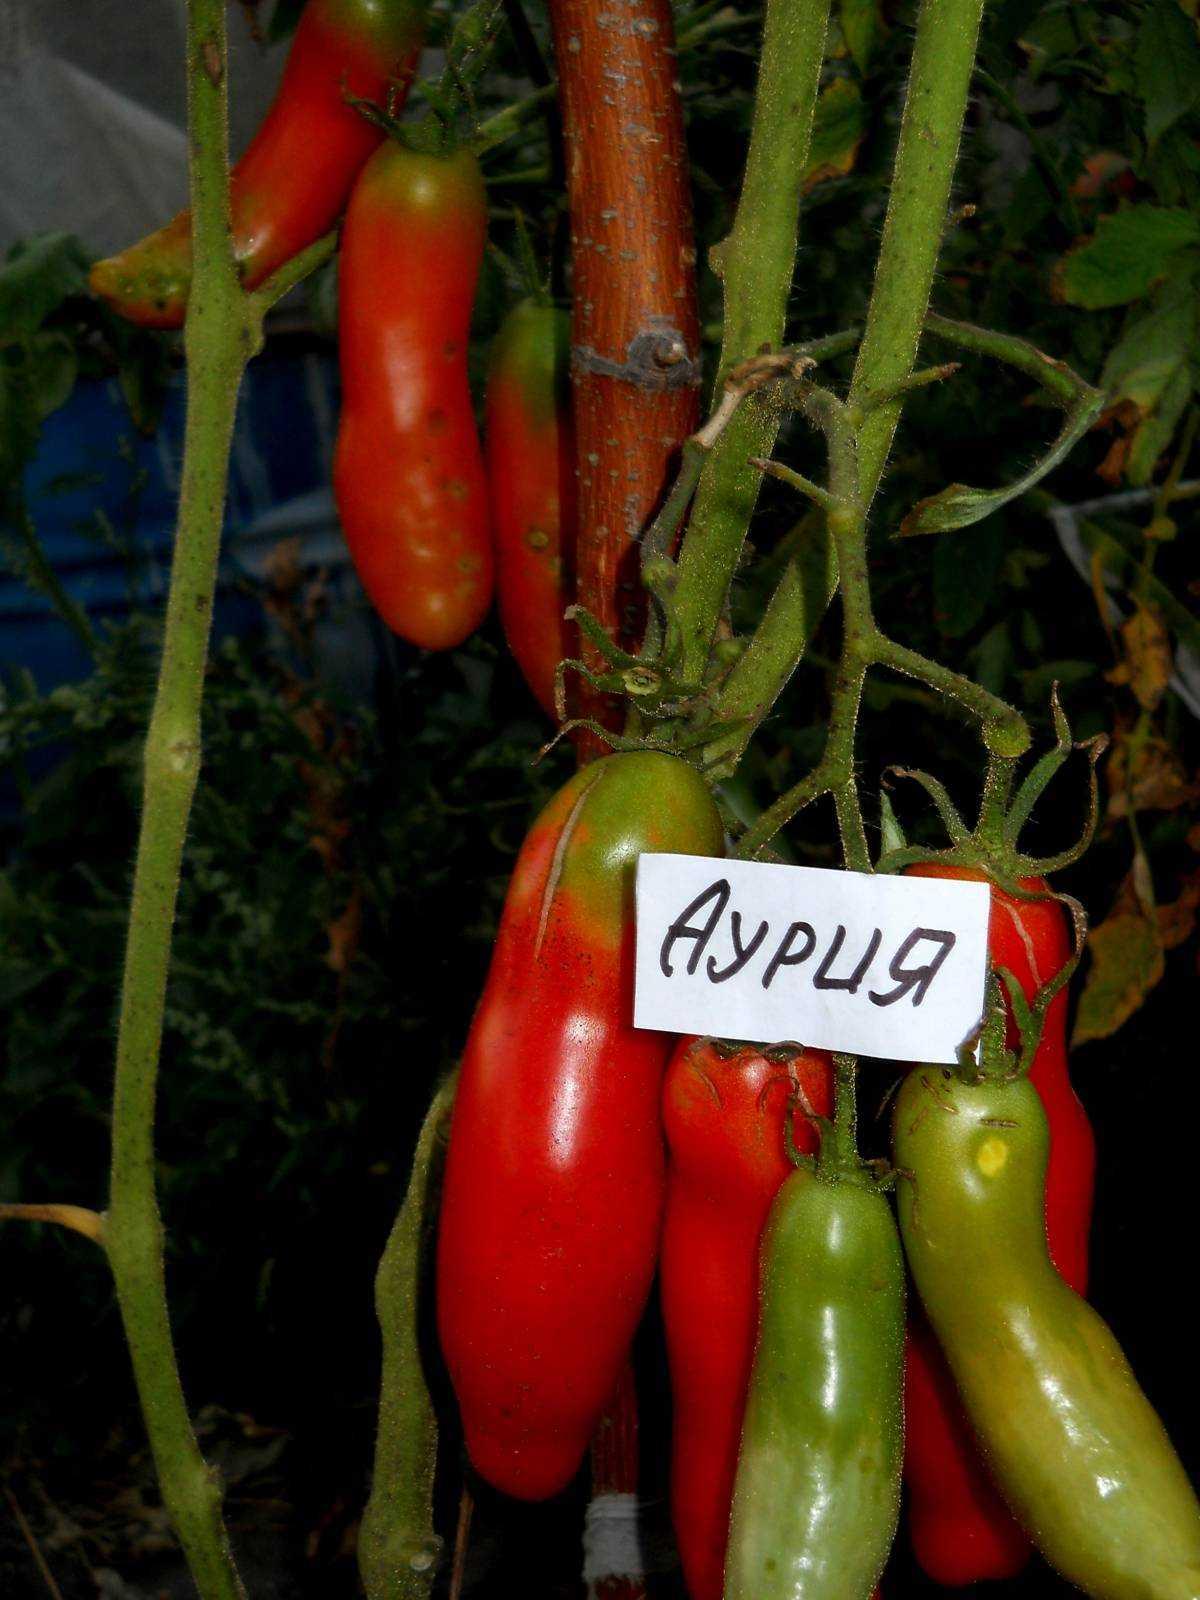 типа меньше помидоры сорта аурия фото стене более